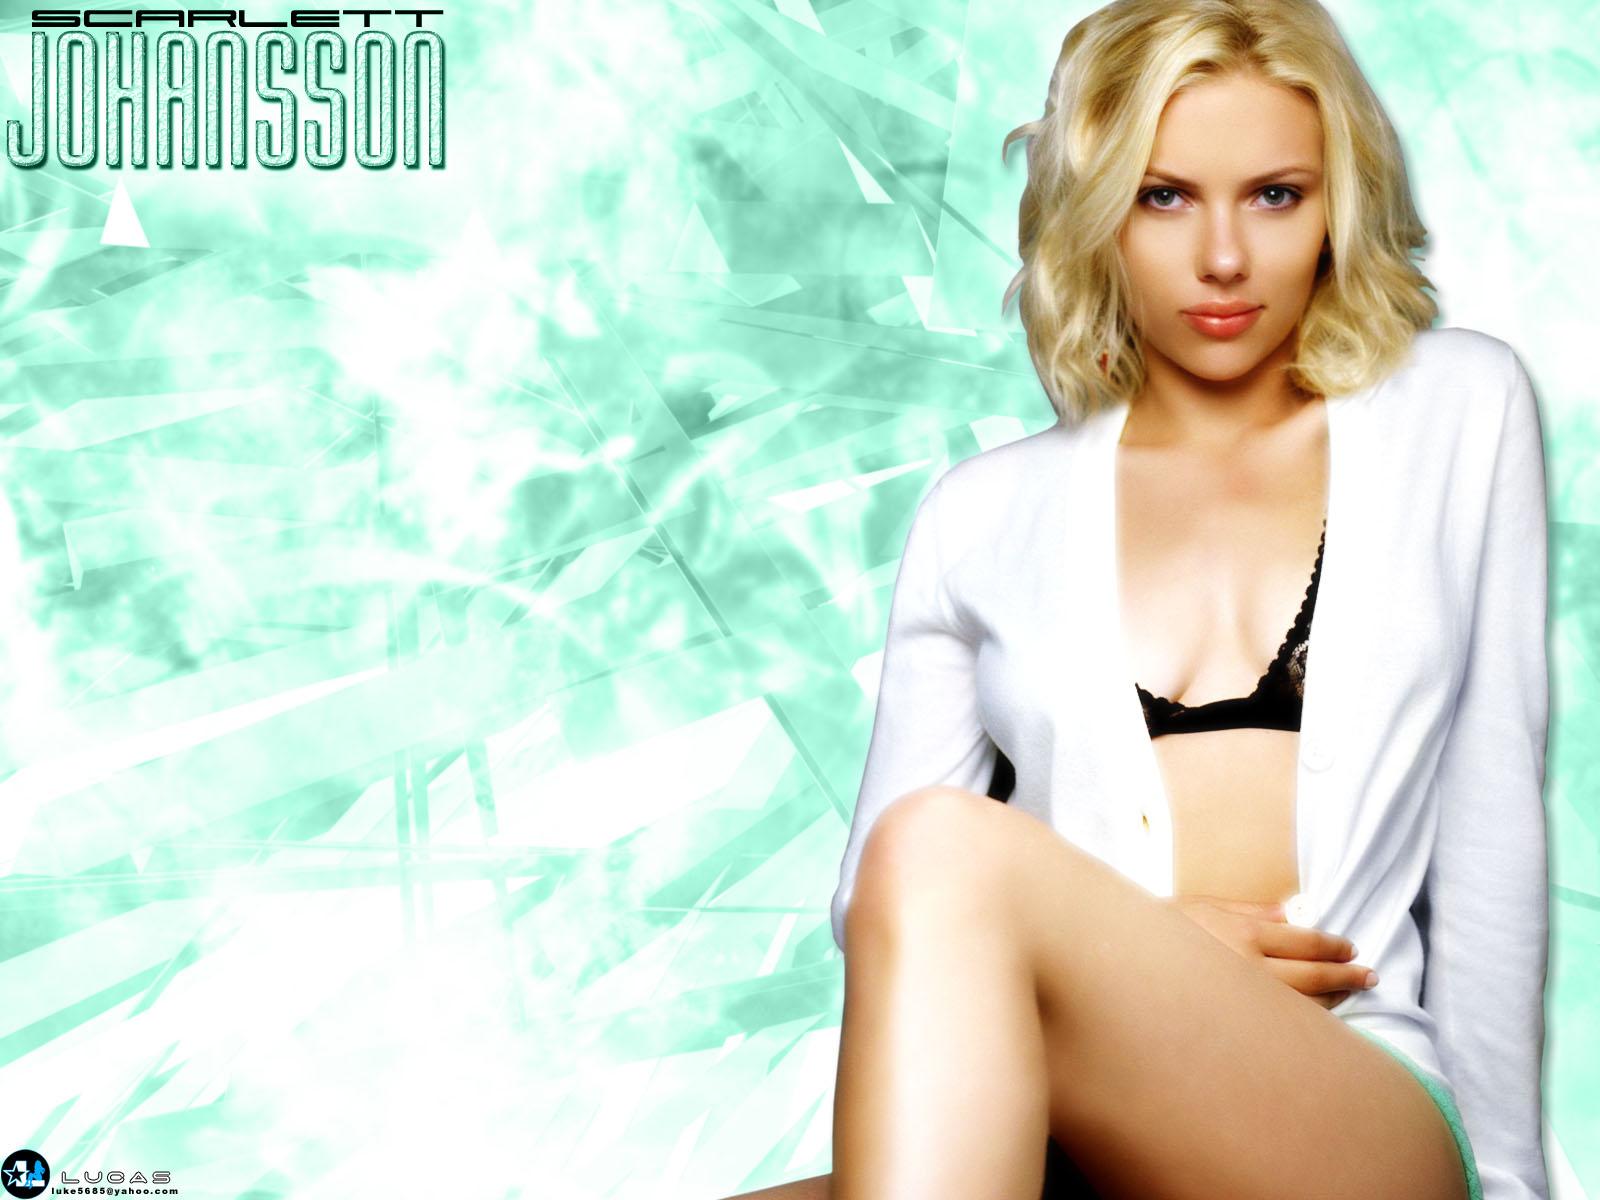 Download Scarlett Johansson wallpaper, 'Scarlett johansson 12'.